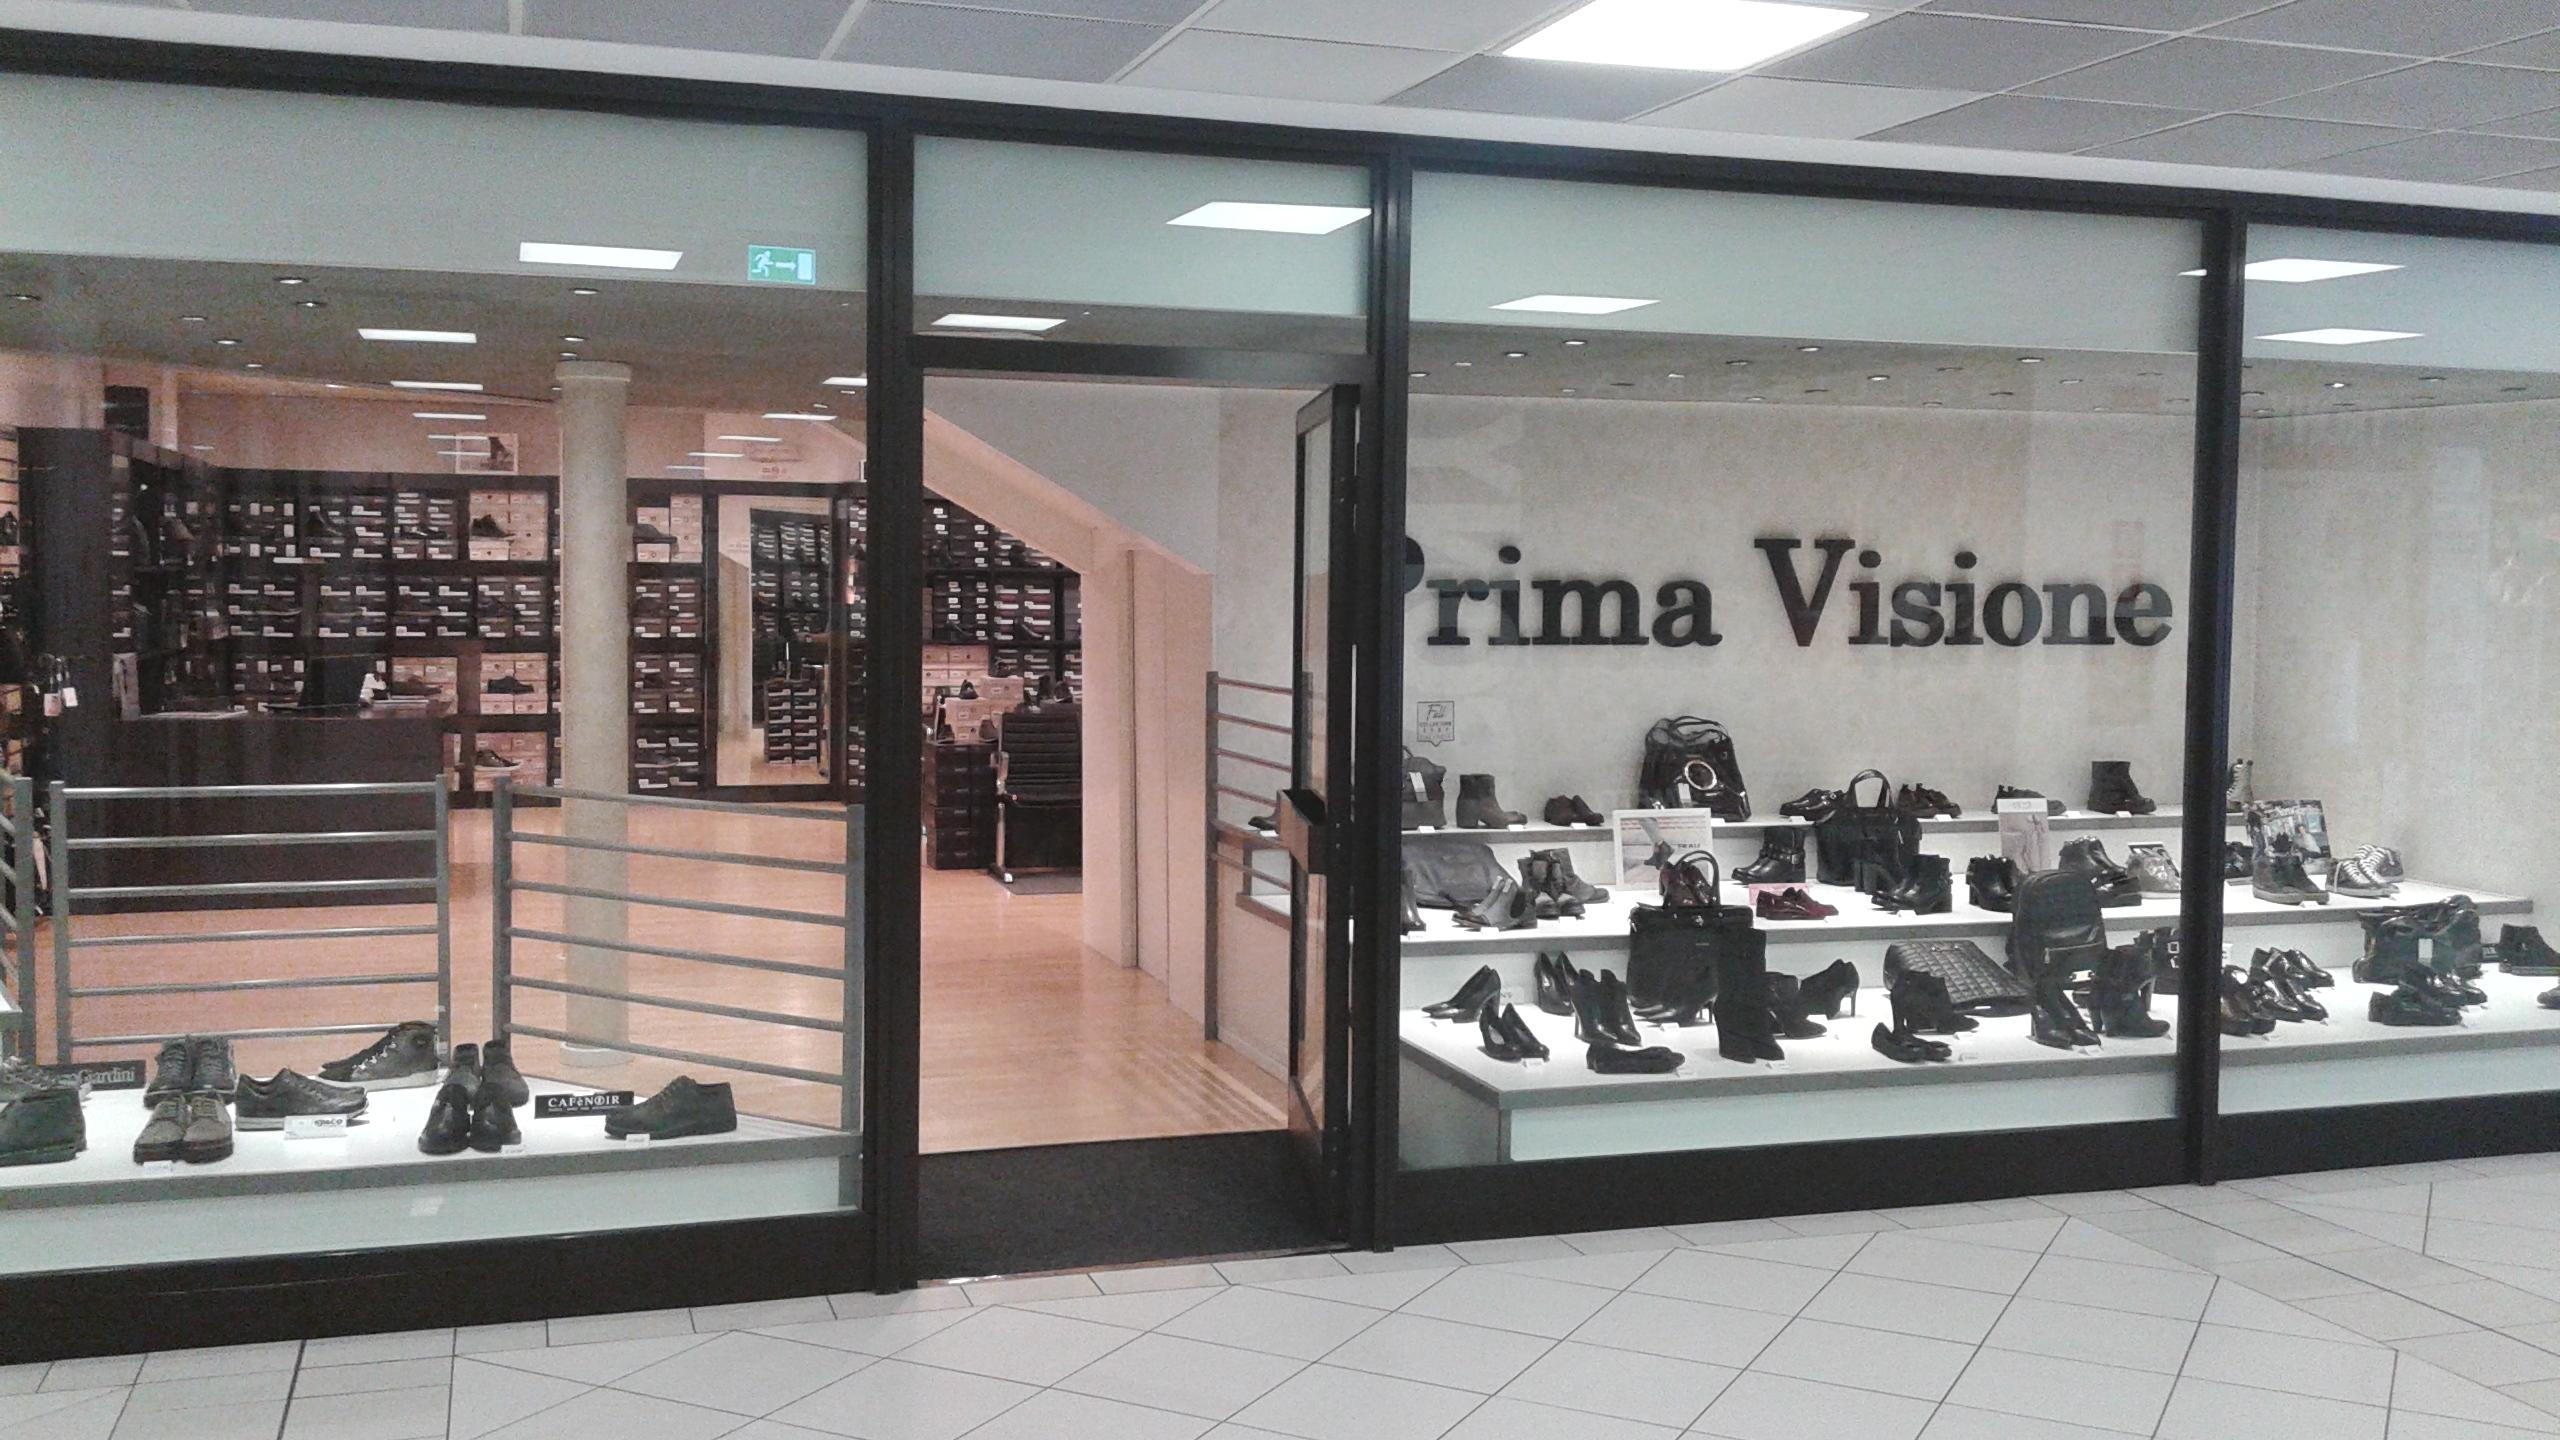 Calzature bren center trento for Orari negozi trento